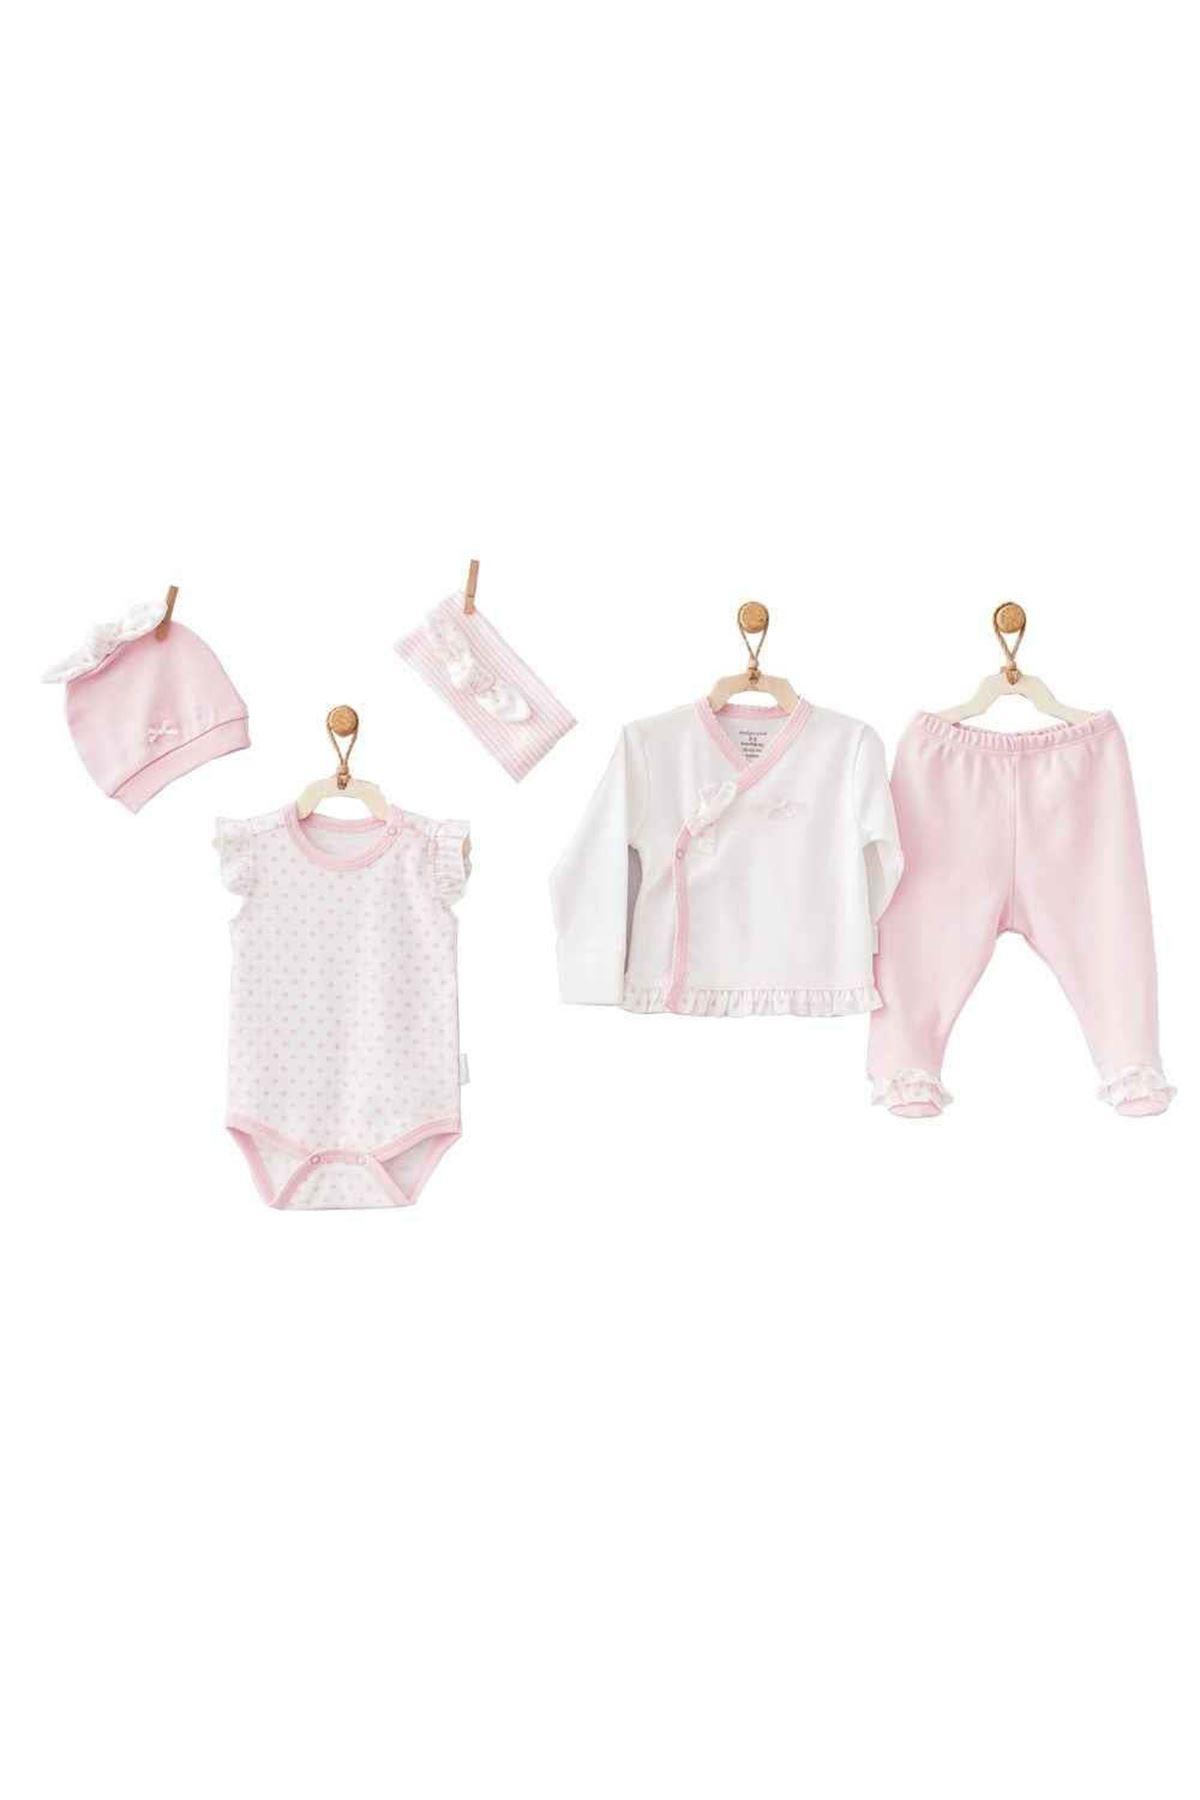 Andywawa AC9590 Small Beautiful 5 Parça Zıbın Seti Hastane Çıkışı Pink